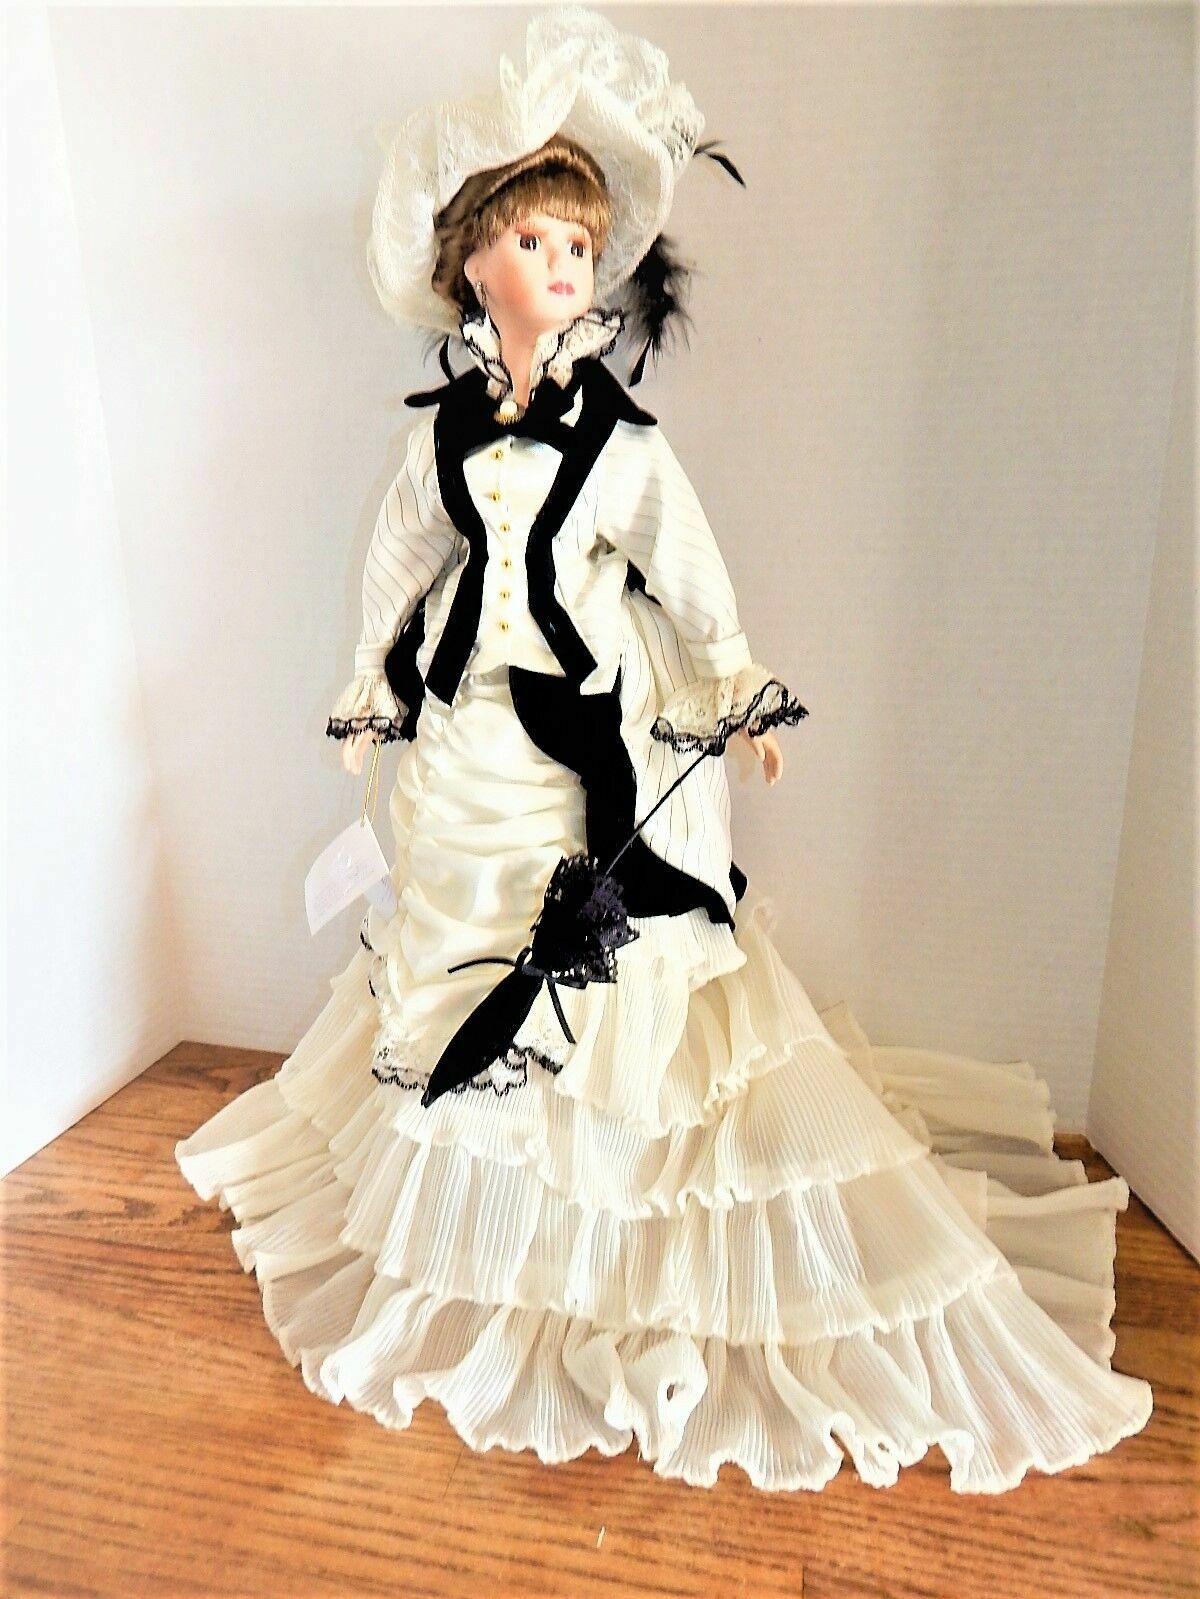 Porcelain bambola Anastasia Collection  22  Eliza VINTAGE 80's nuovo without scatola  perfezionare